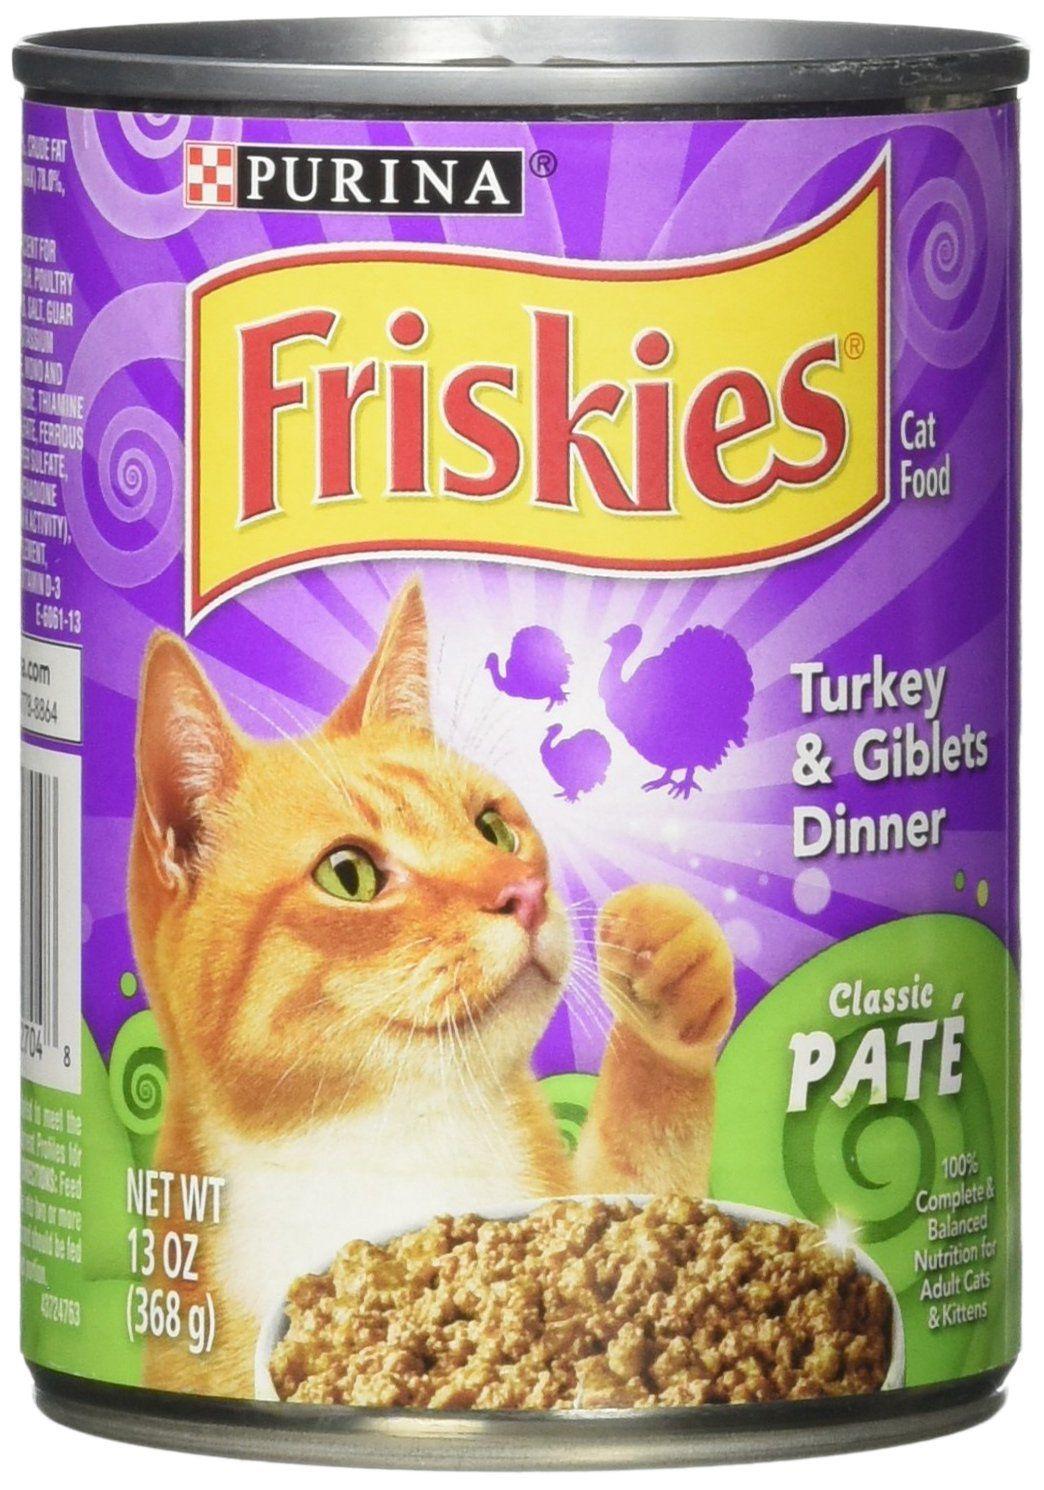 Mix Cat Breed In 2020 Purina Friskies Friskies Canned Cat Food